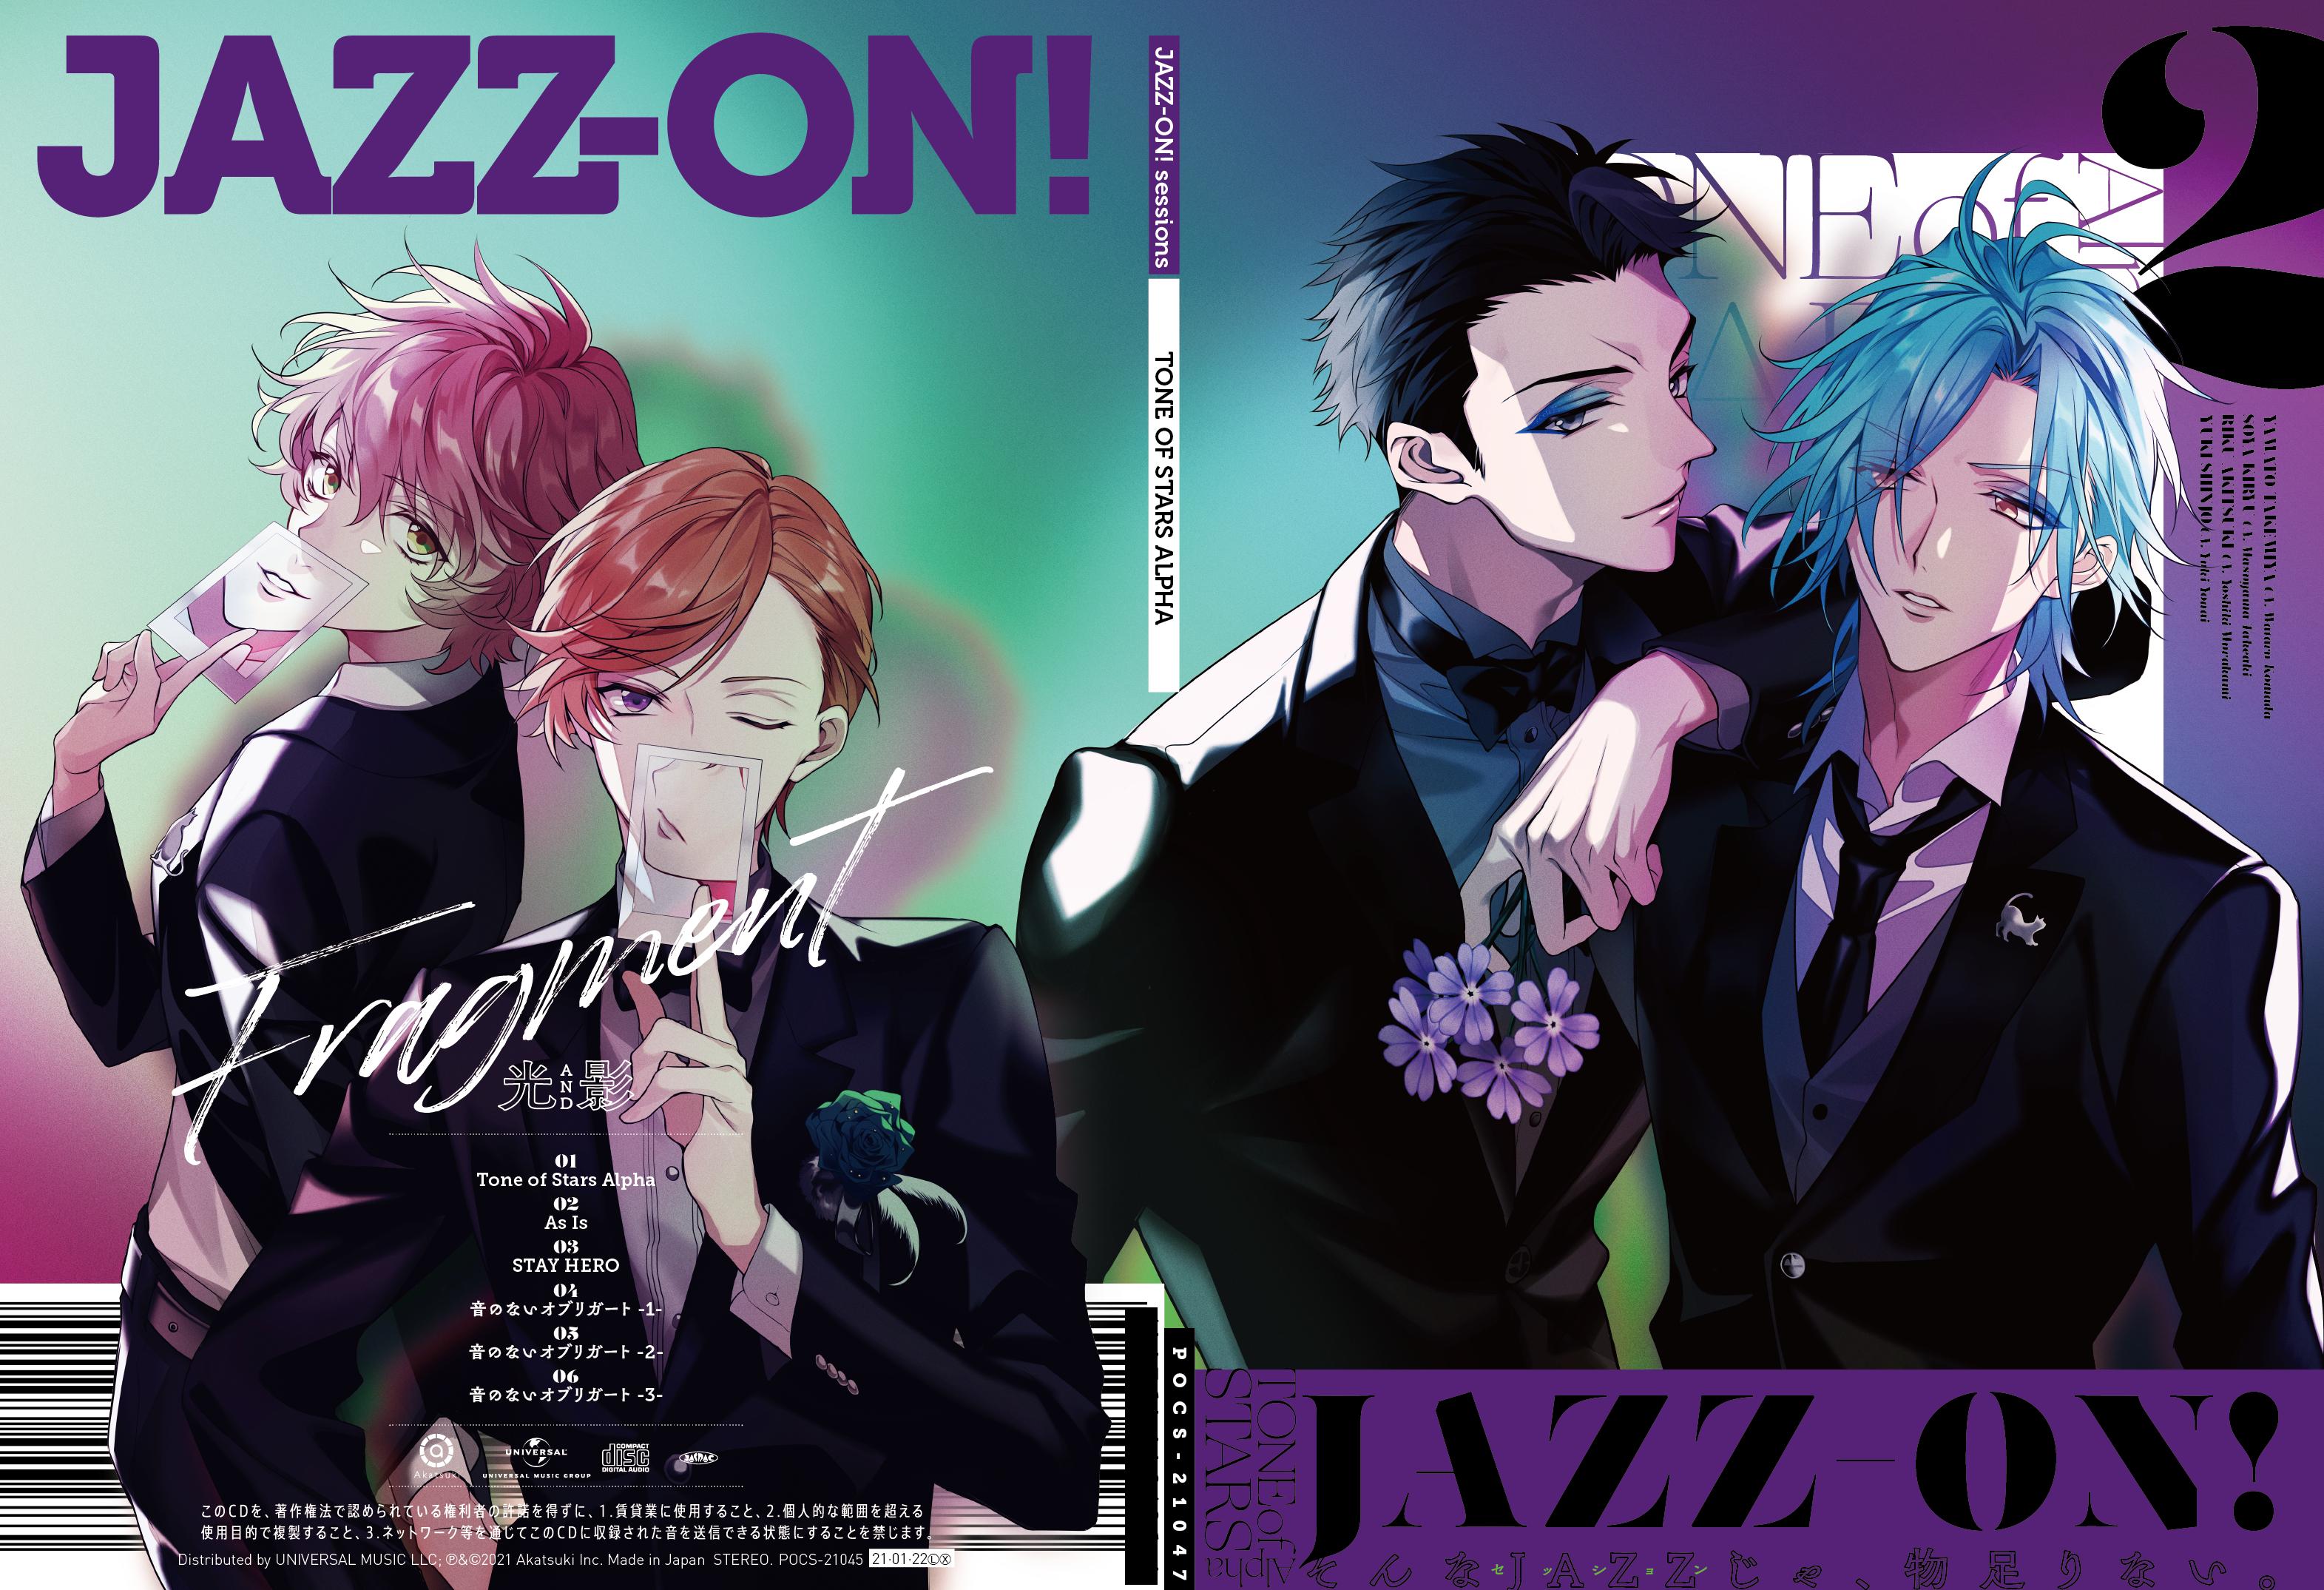 「JAZZ-ON!」ミニアルバム「Tone of Stars Alpha」ジャケット&店舗別特典情報が解禁!